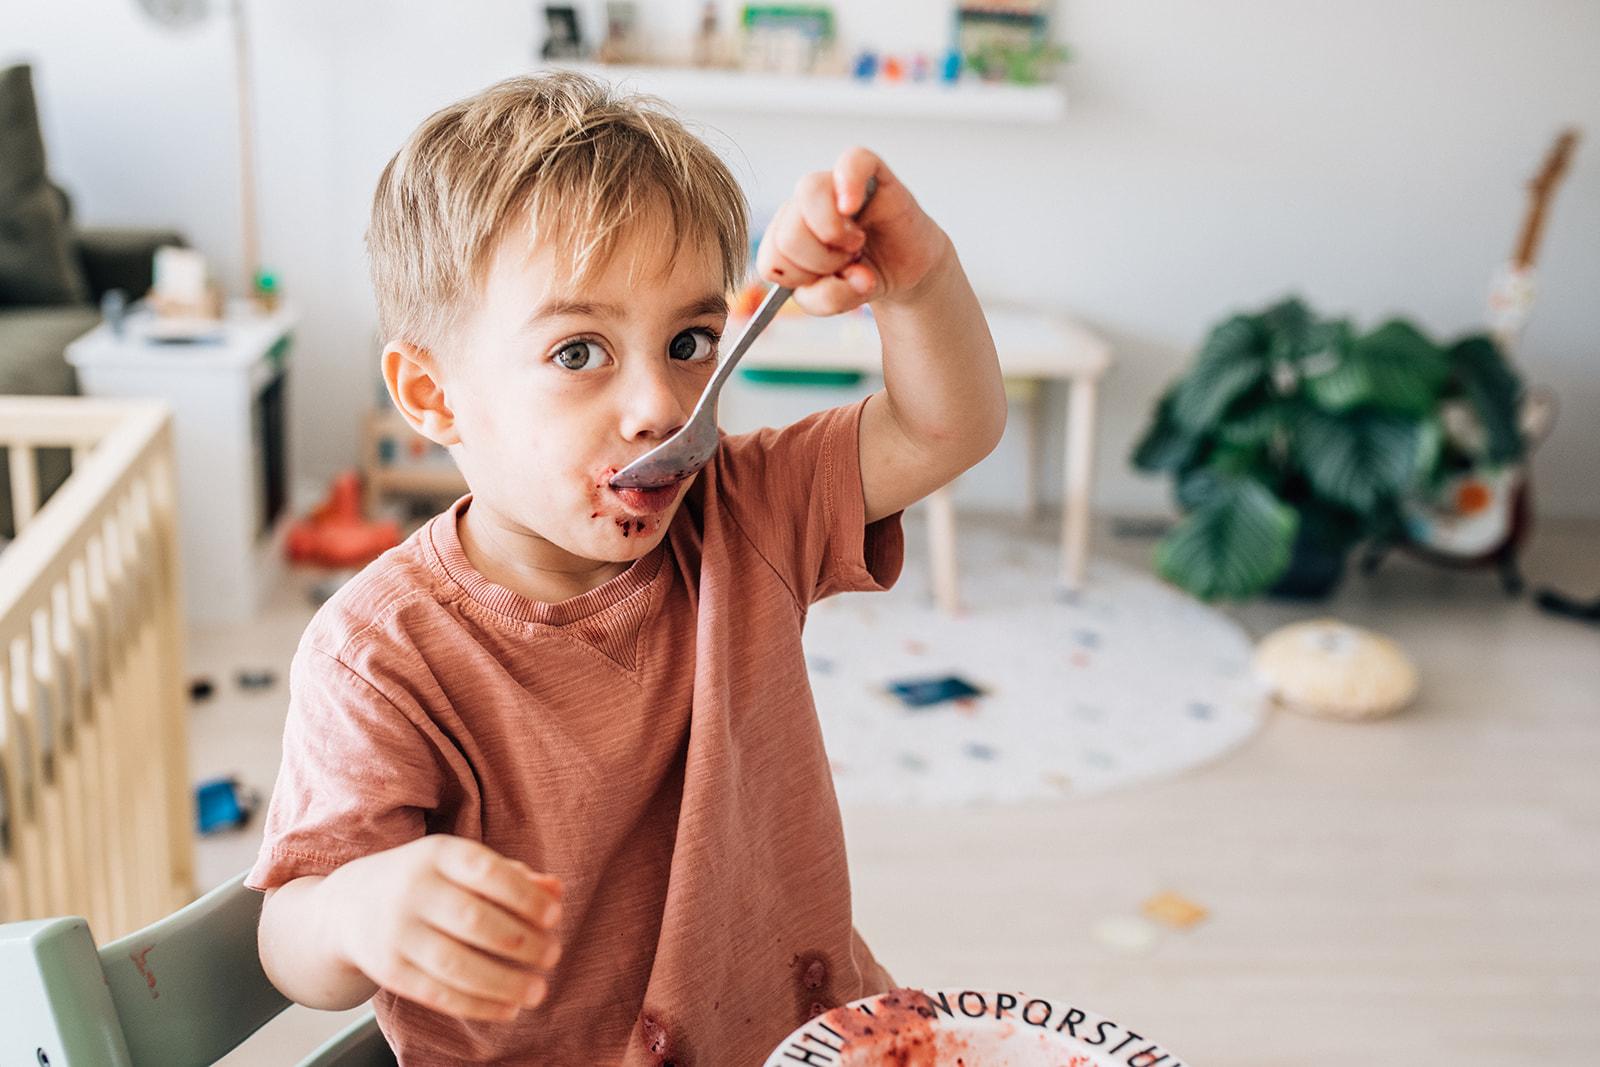 kid eating a messy pink desert